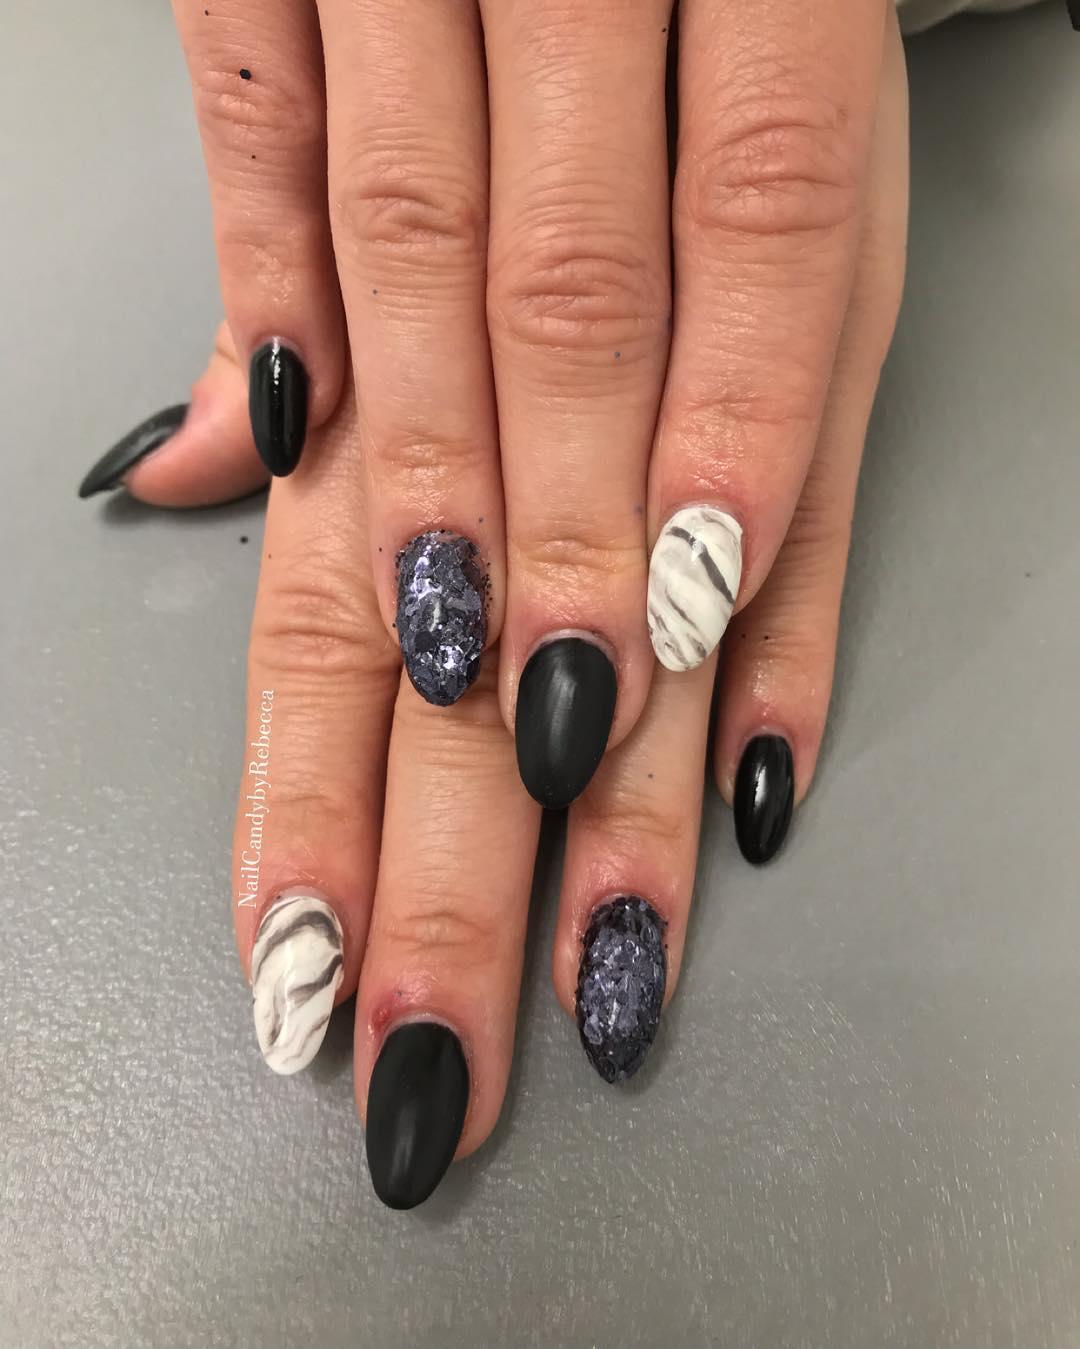 trendy black nail art designs and ideas 2019 2 - Trendy Black Nail Art Designs and Ideas 2019